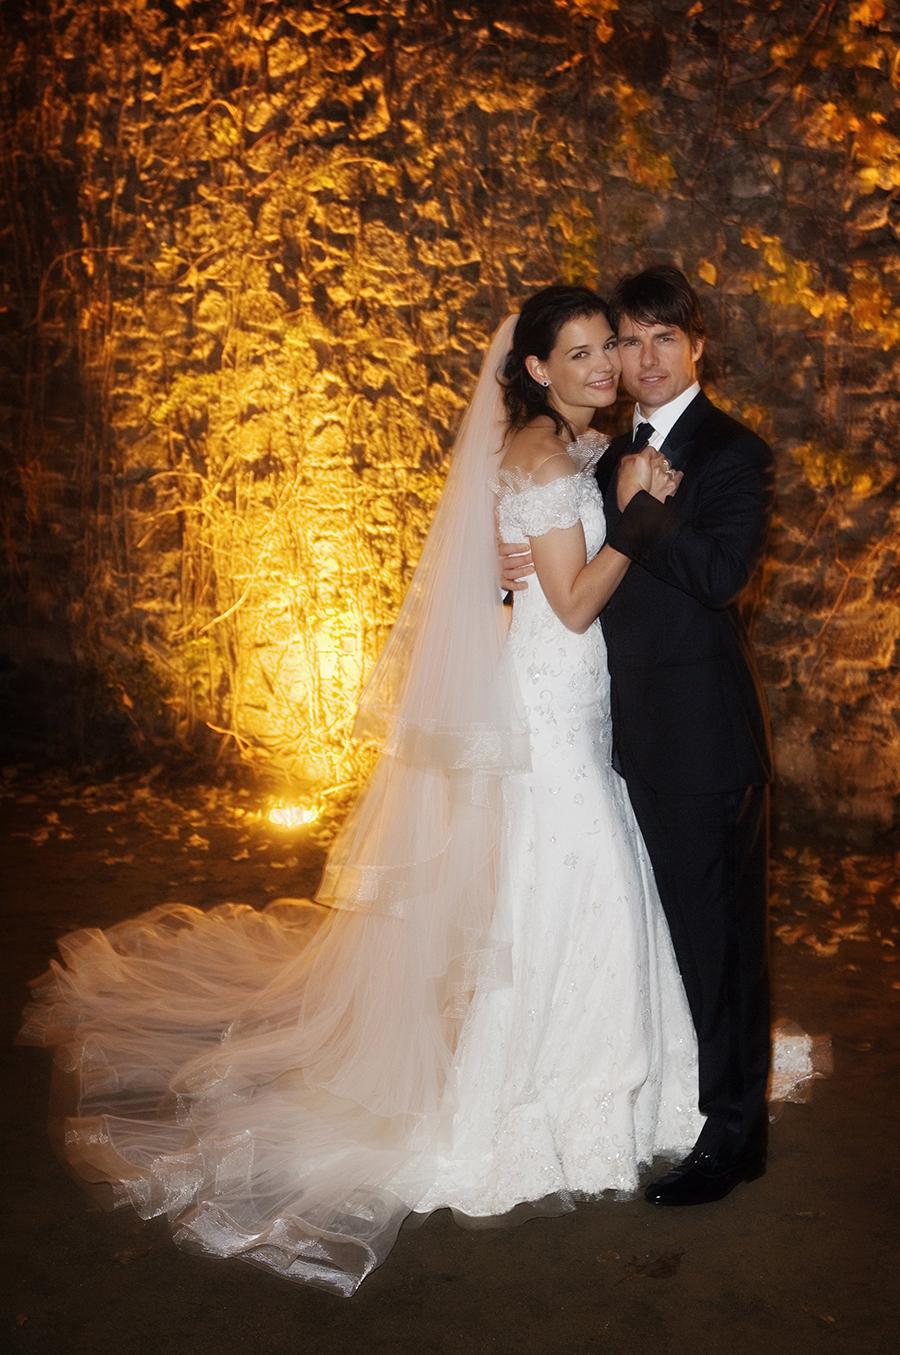 свадьба том круз кэти холмс свадебное платье армани giorgio armani